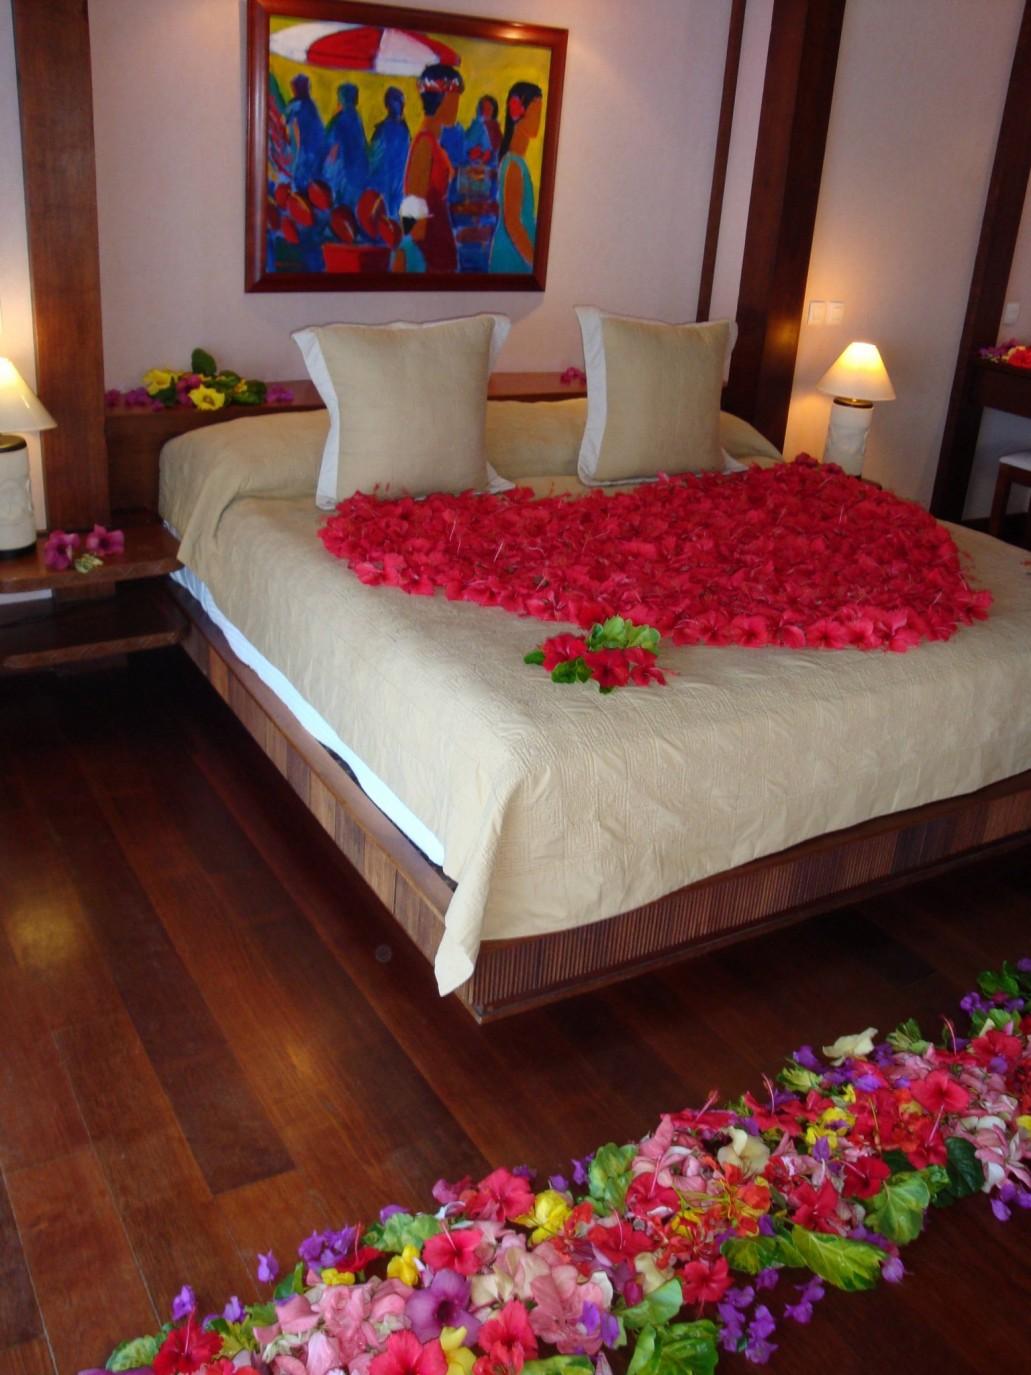 Pakistani Bridal Room Decoration 2020 for Wedding Night ...